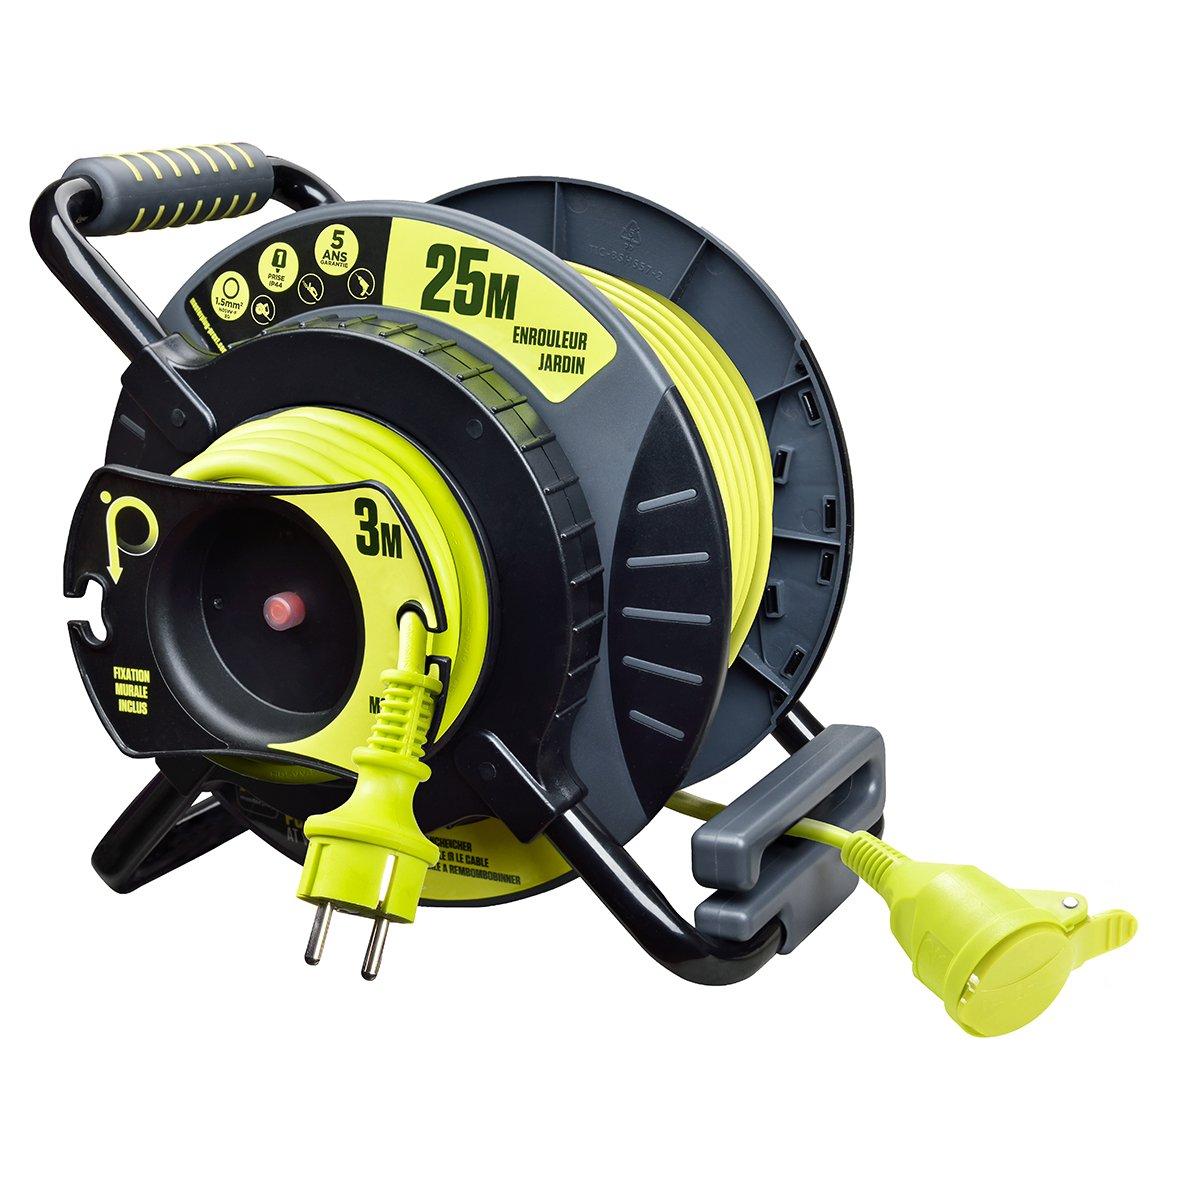 Masterplug oatrf2516fl3ip-px avvolgicavo elettrico di giardino, 220V, Nero/Giallo 220V Luceco